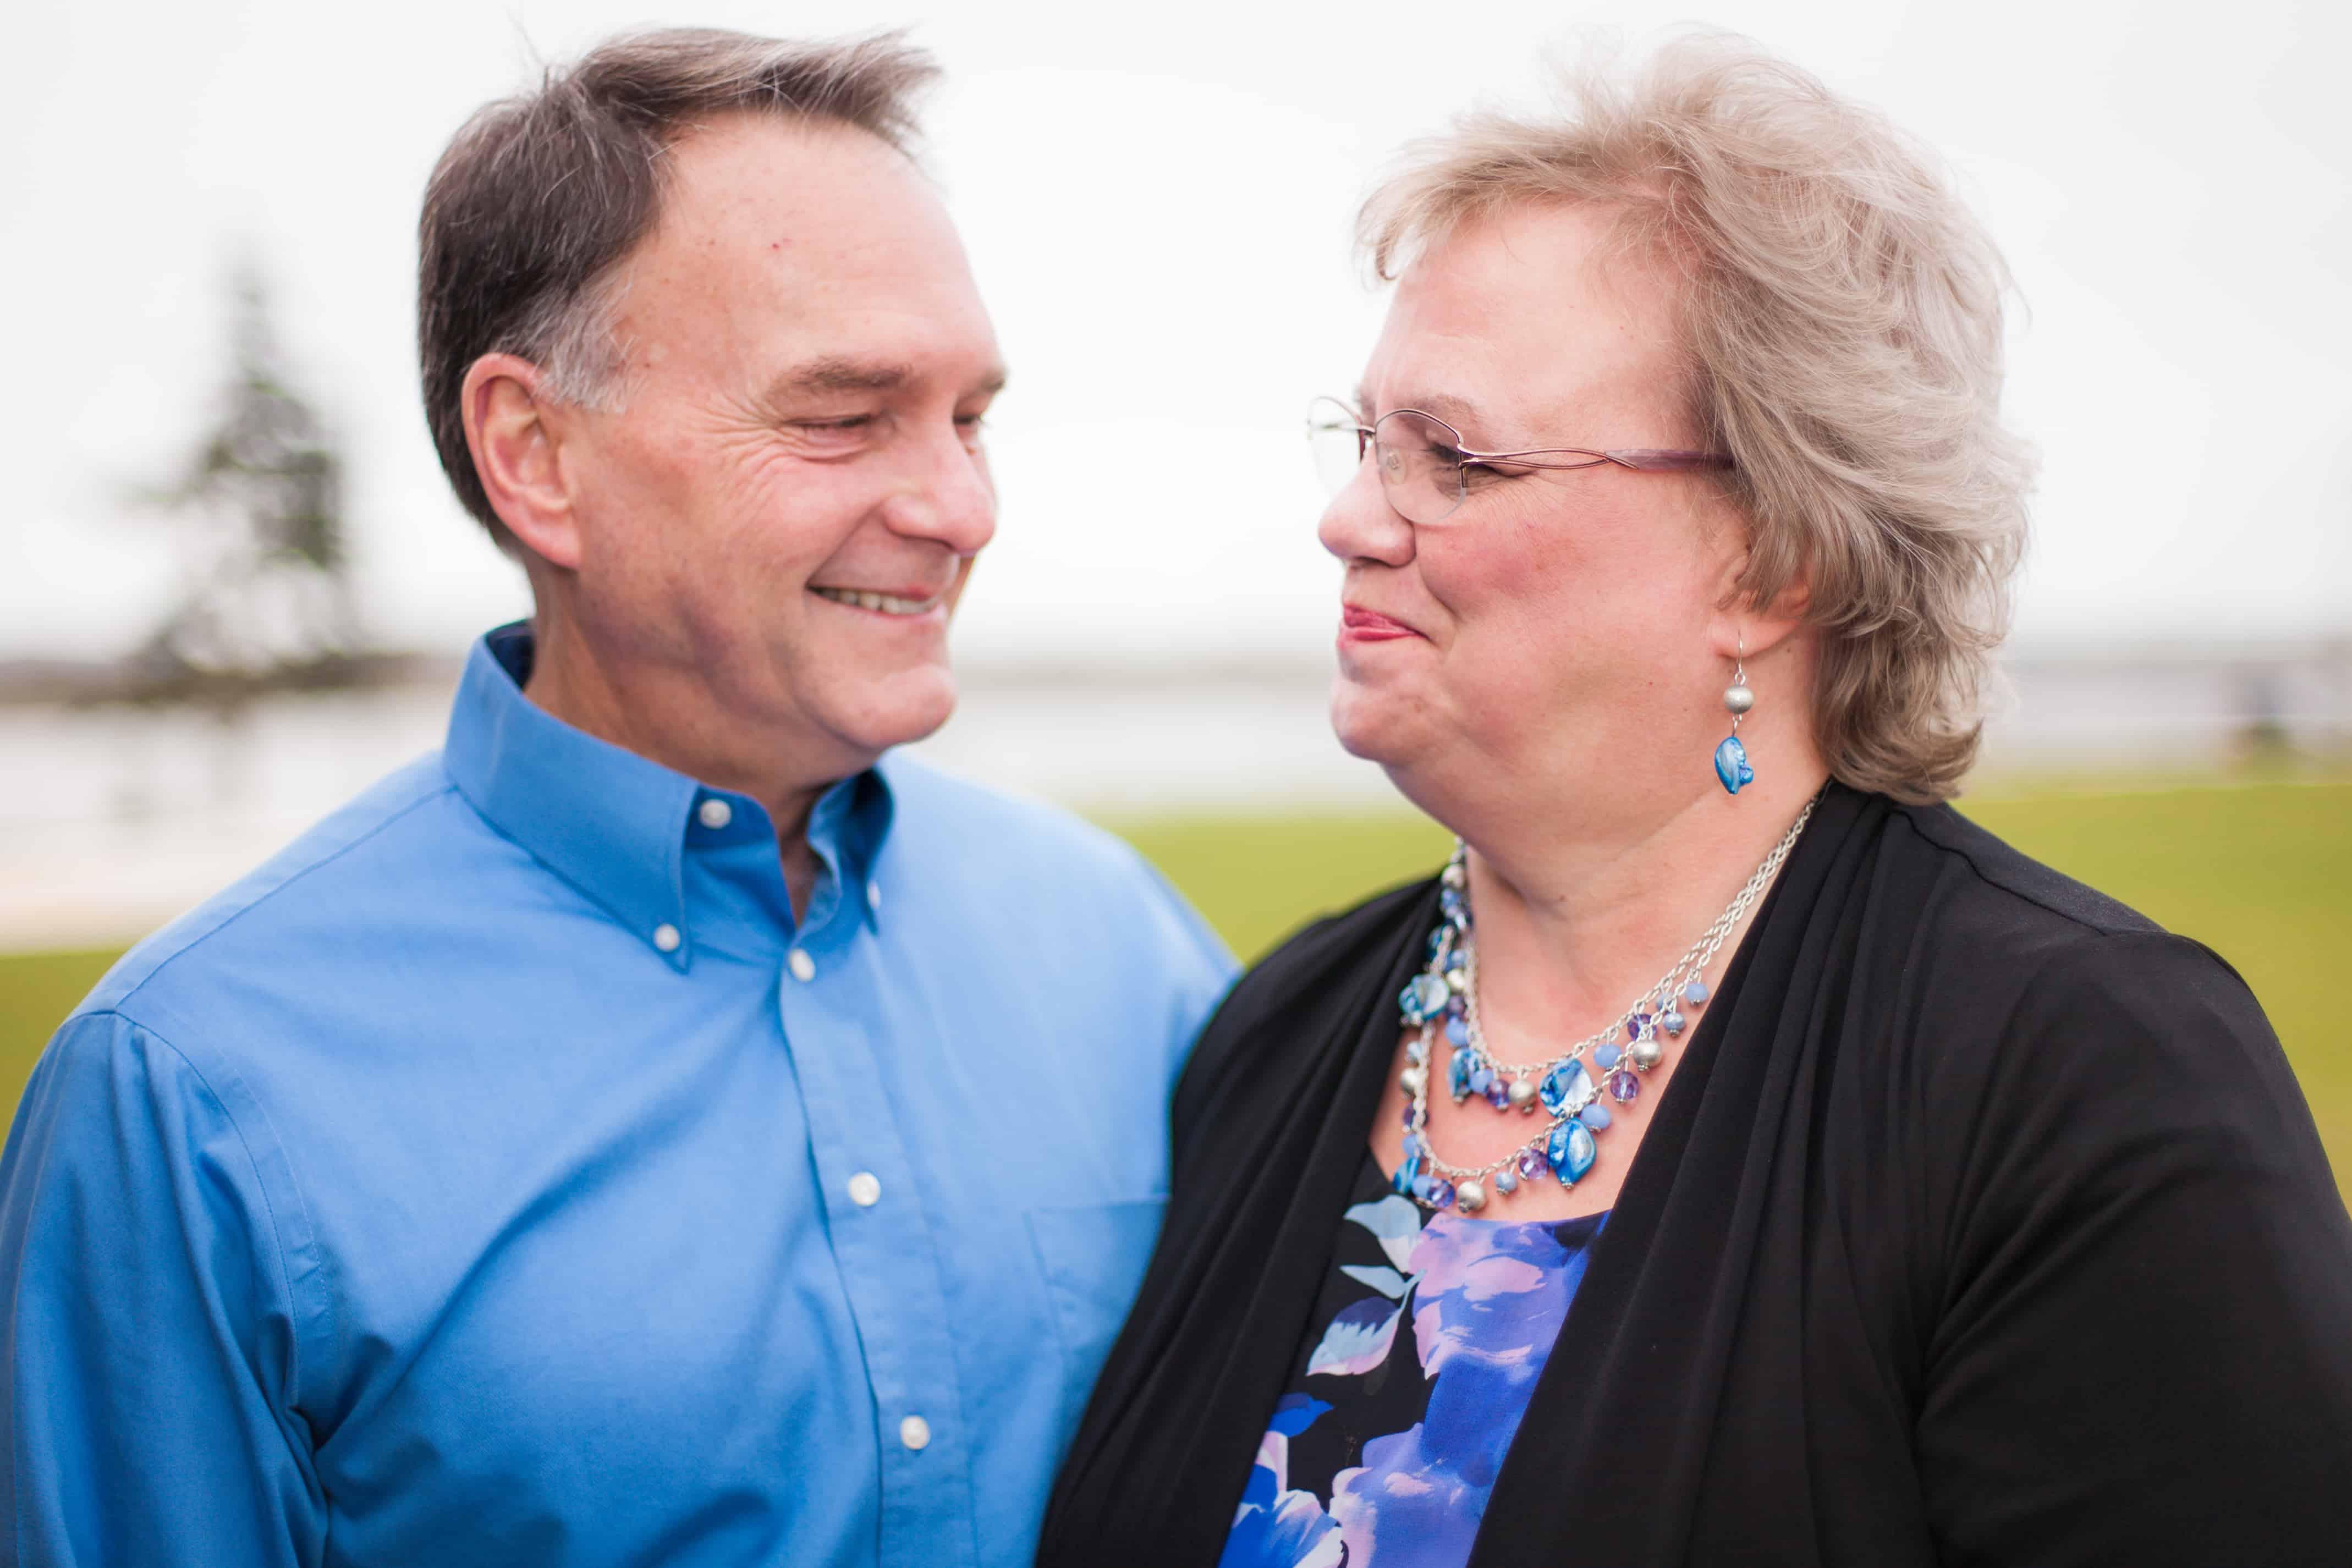 Joe and Sheryl Stephens